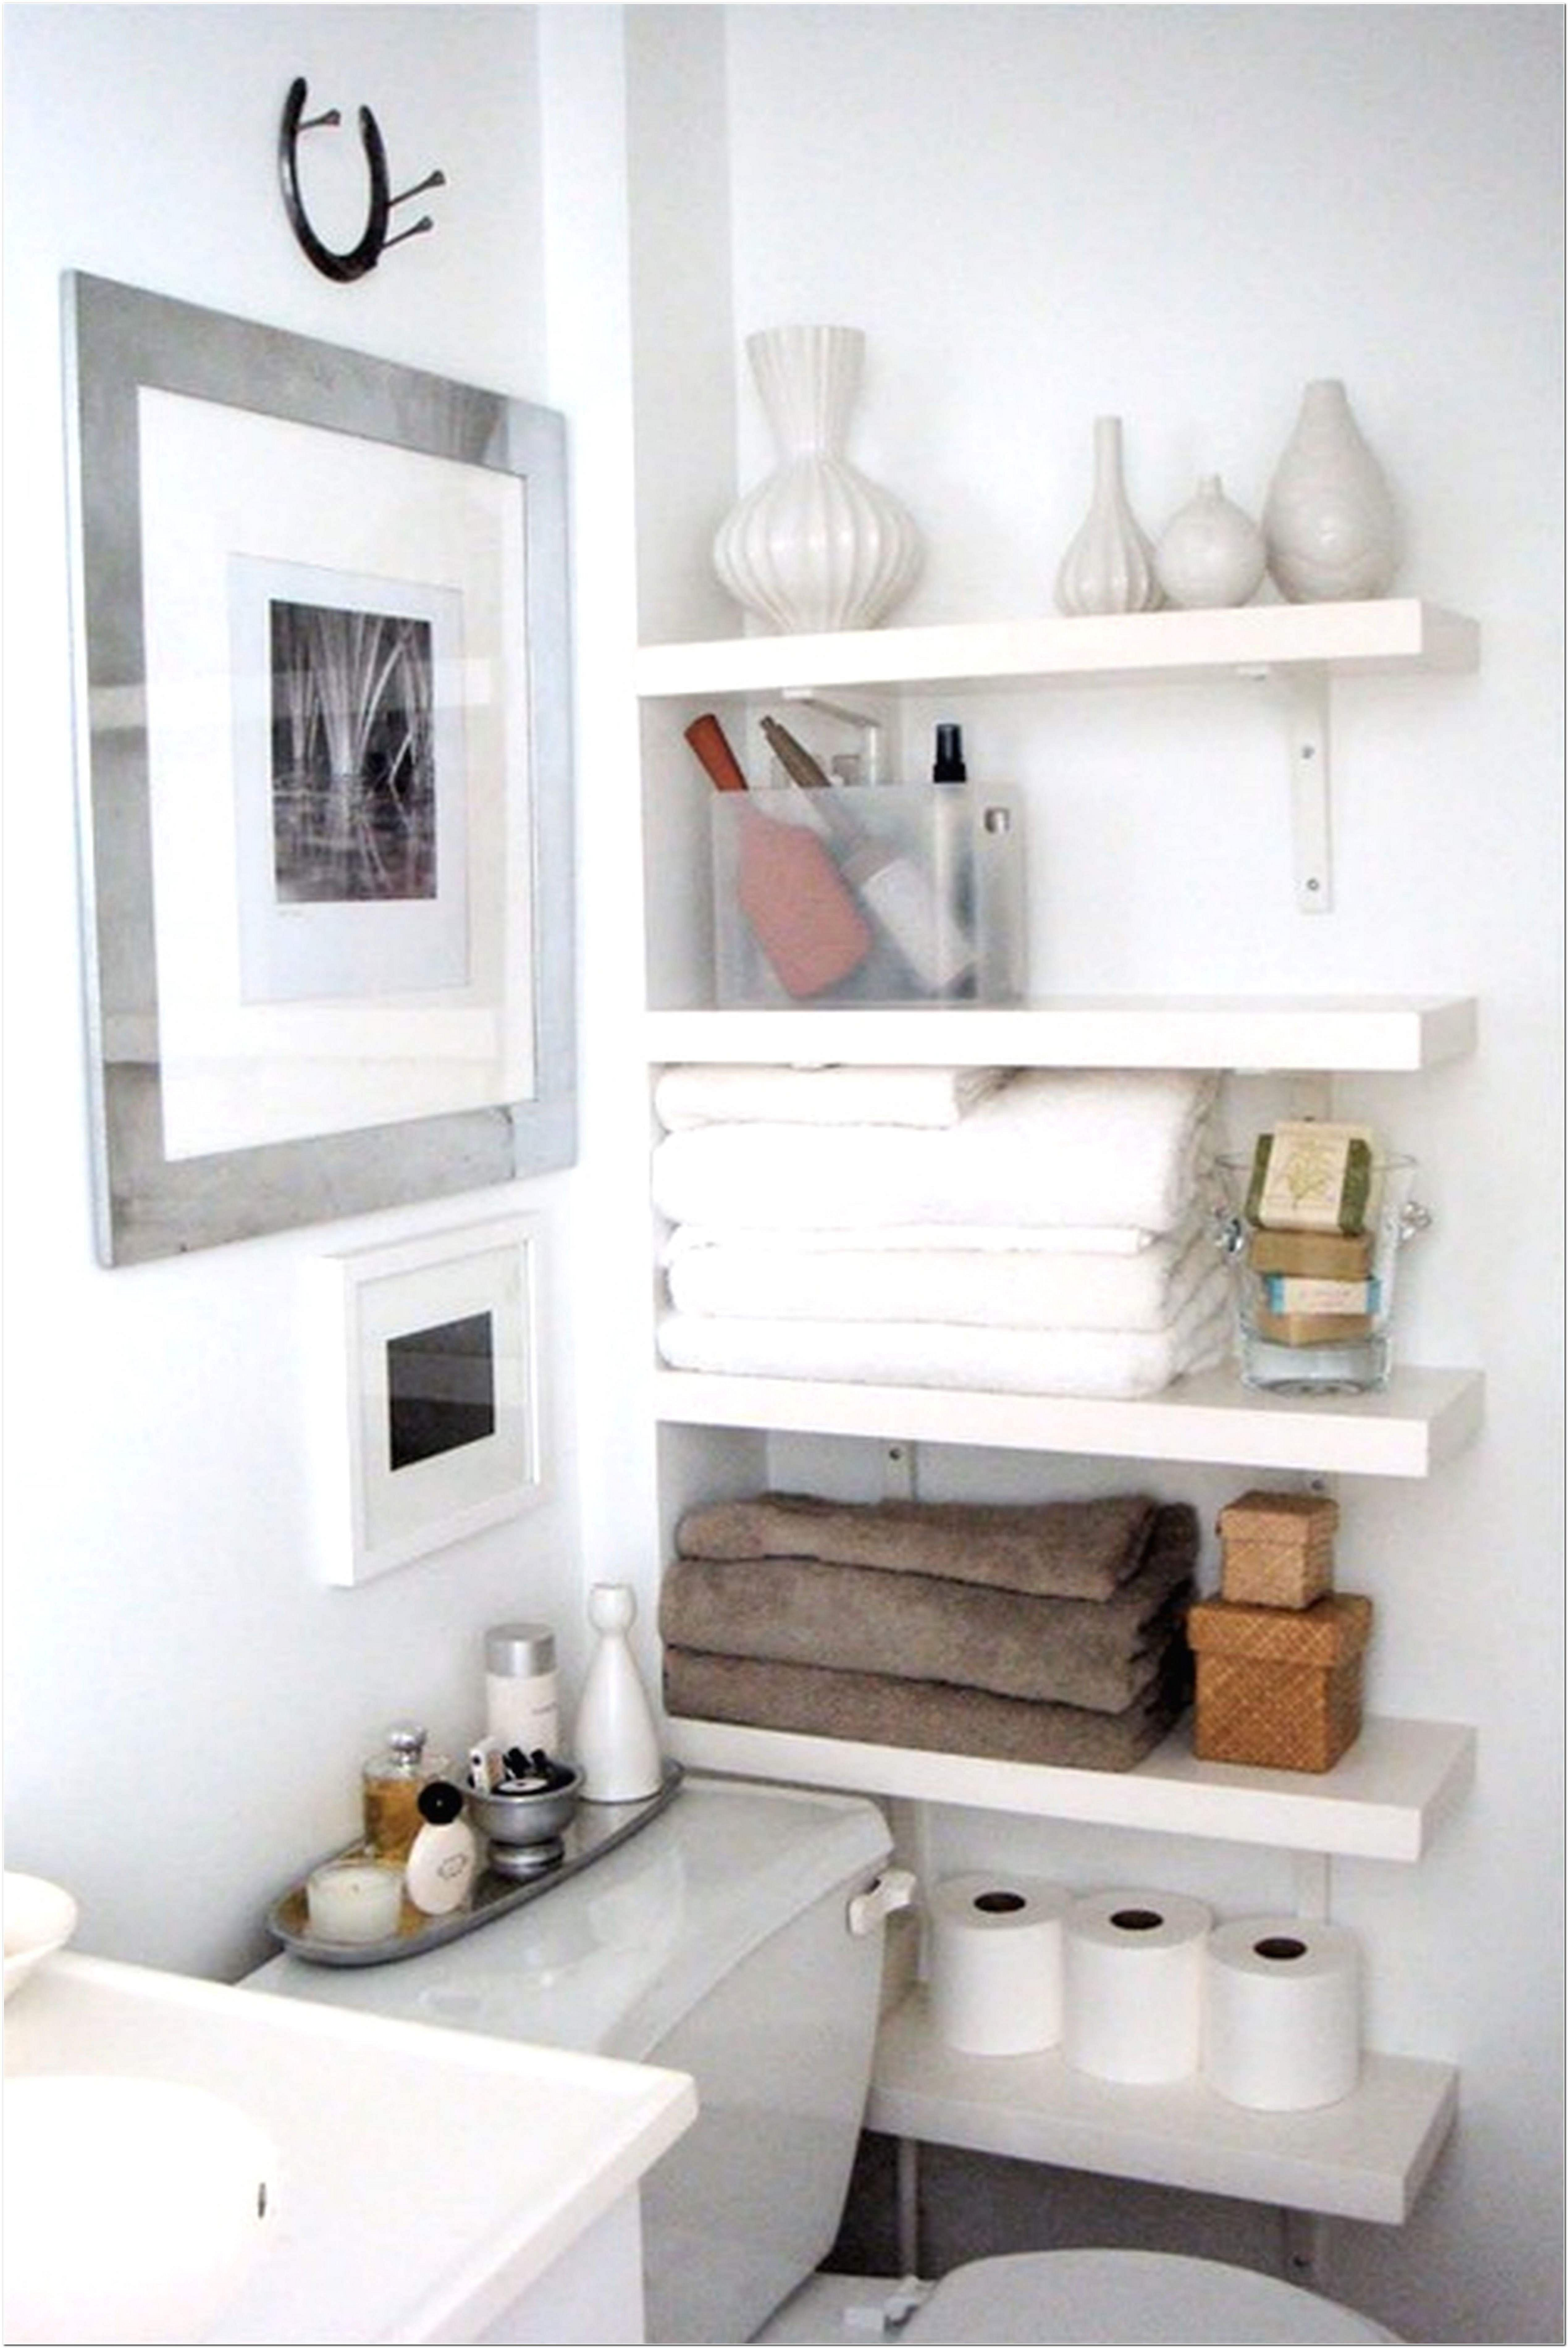 10 Adorable Small Bathroom Storage And Organization Ideas Bathroom Storage Solutions Home Small Bathroom Decor